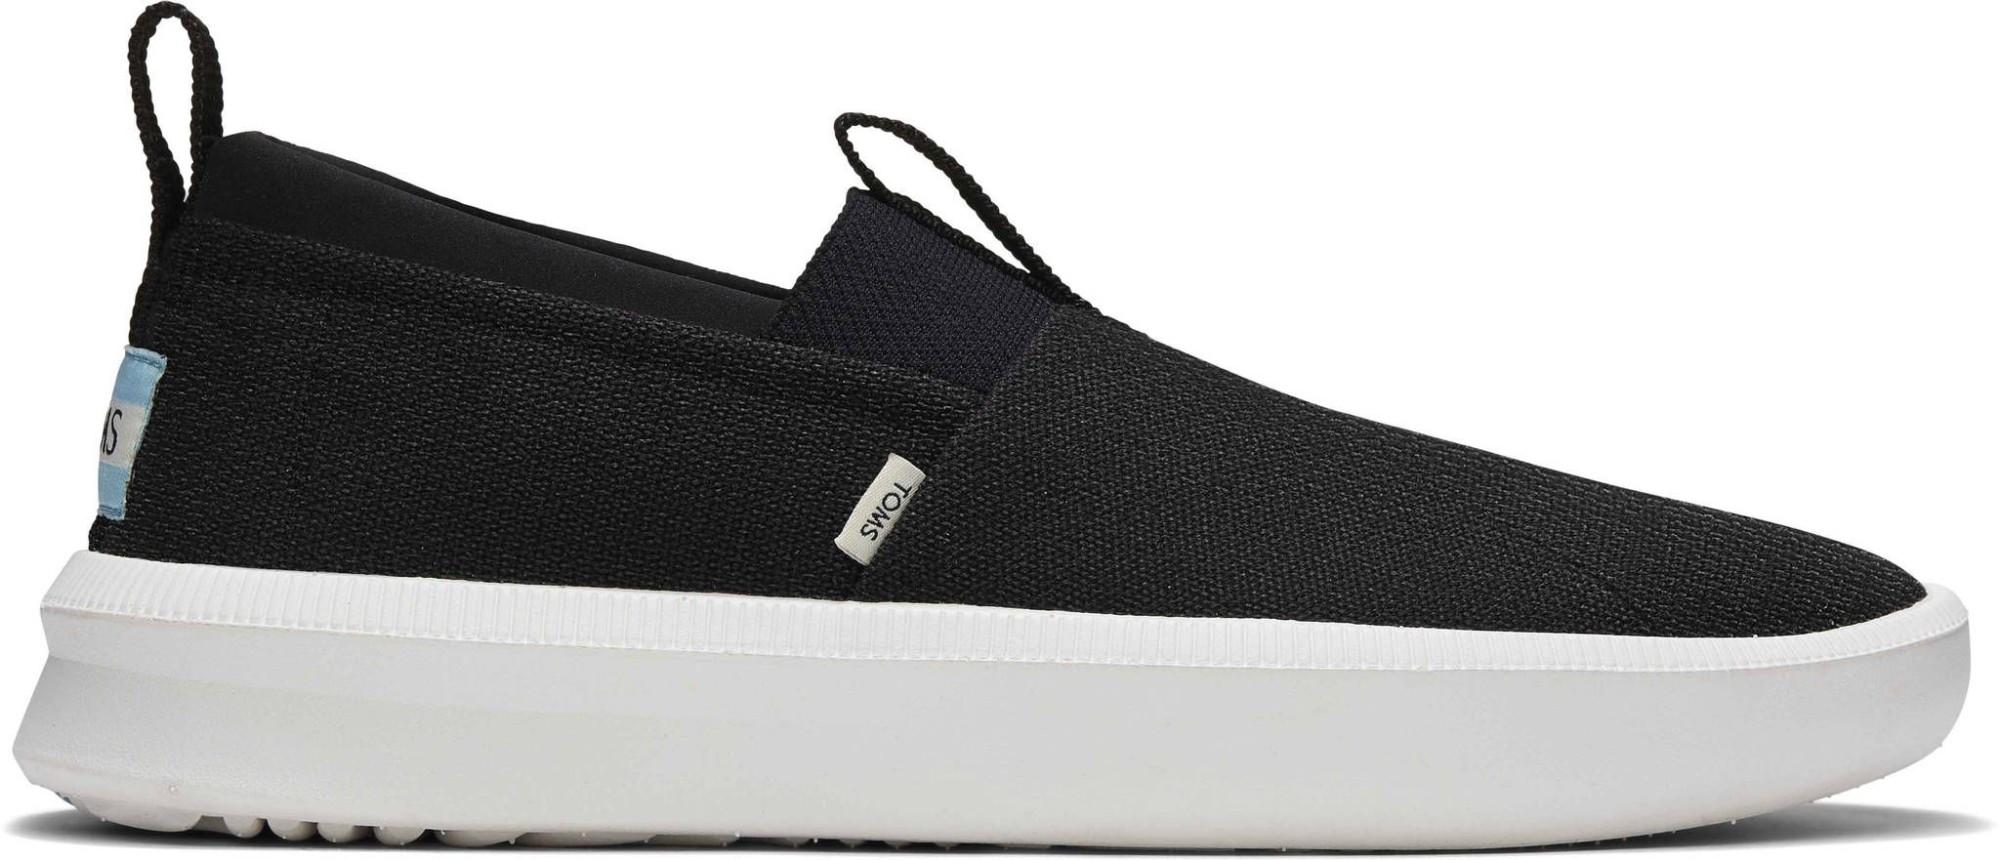 TOMS Heritage Canvas Men's Rover Slip-On Sneaker Black 43